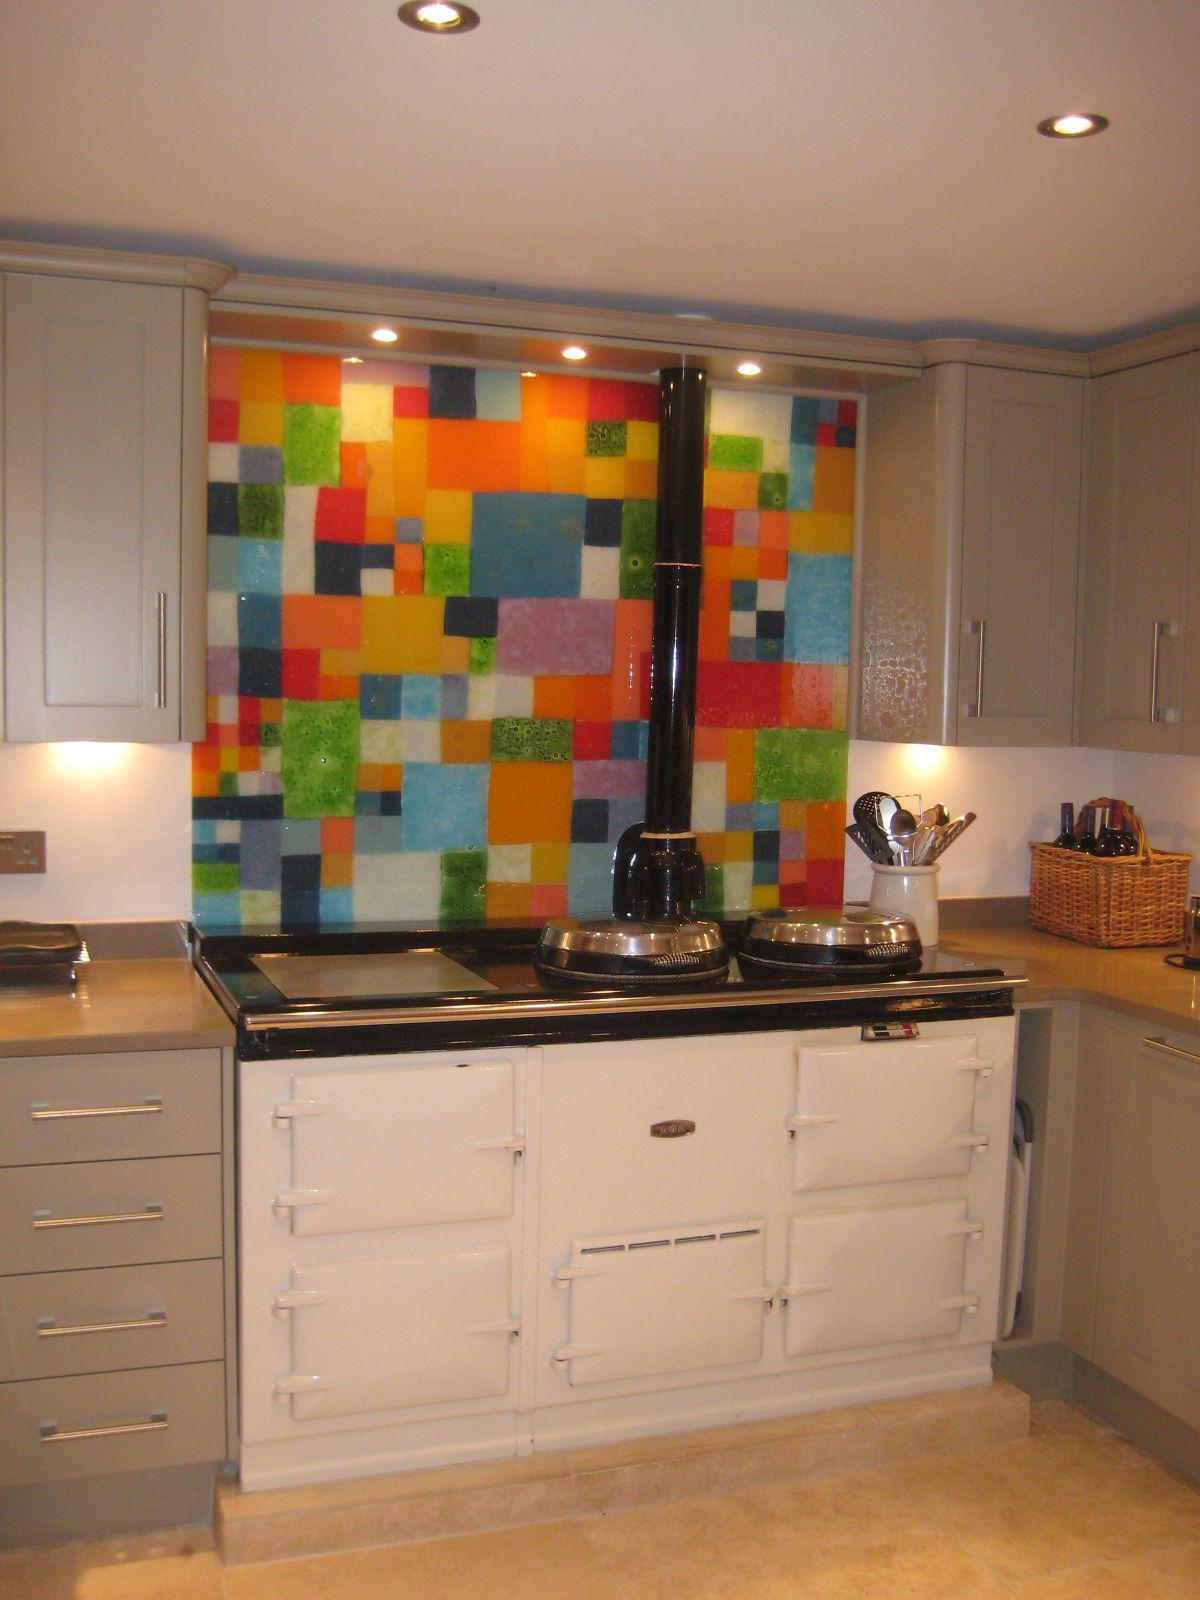 Uncategorized Colour Tiles For Kitchen kitchen splashback ideas google search splashbacks pinterest colour tiles for best floor white cream kitchen